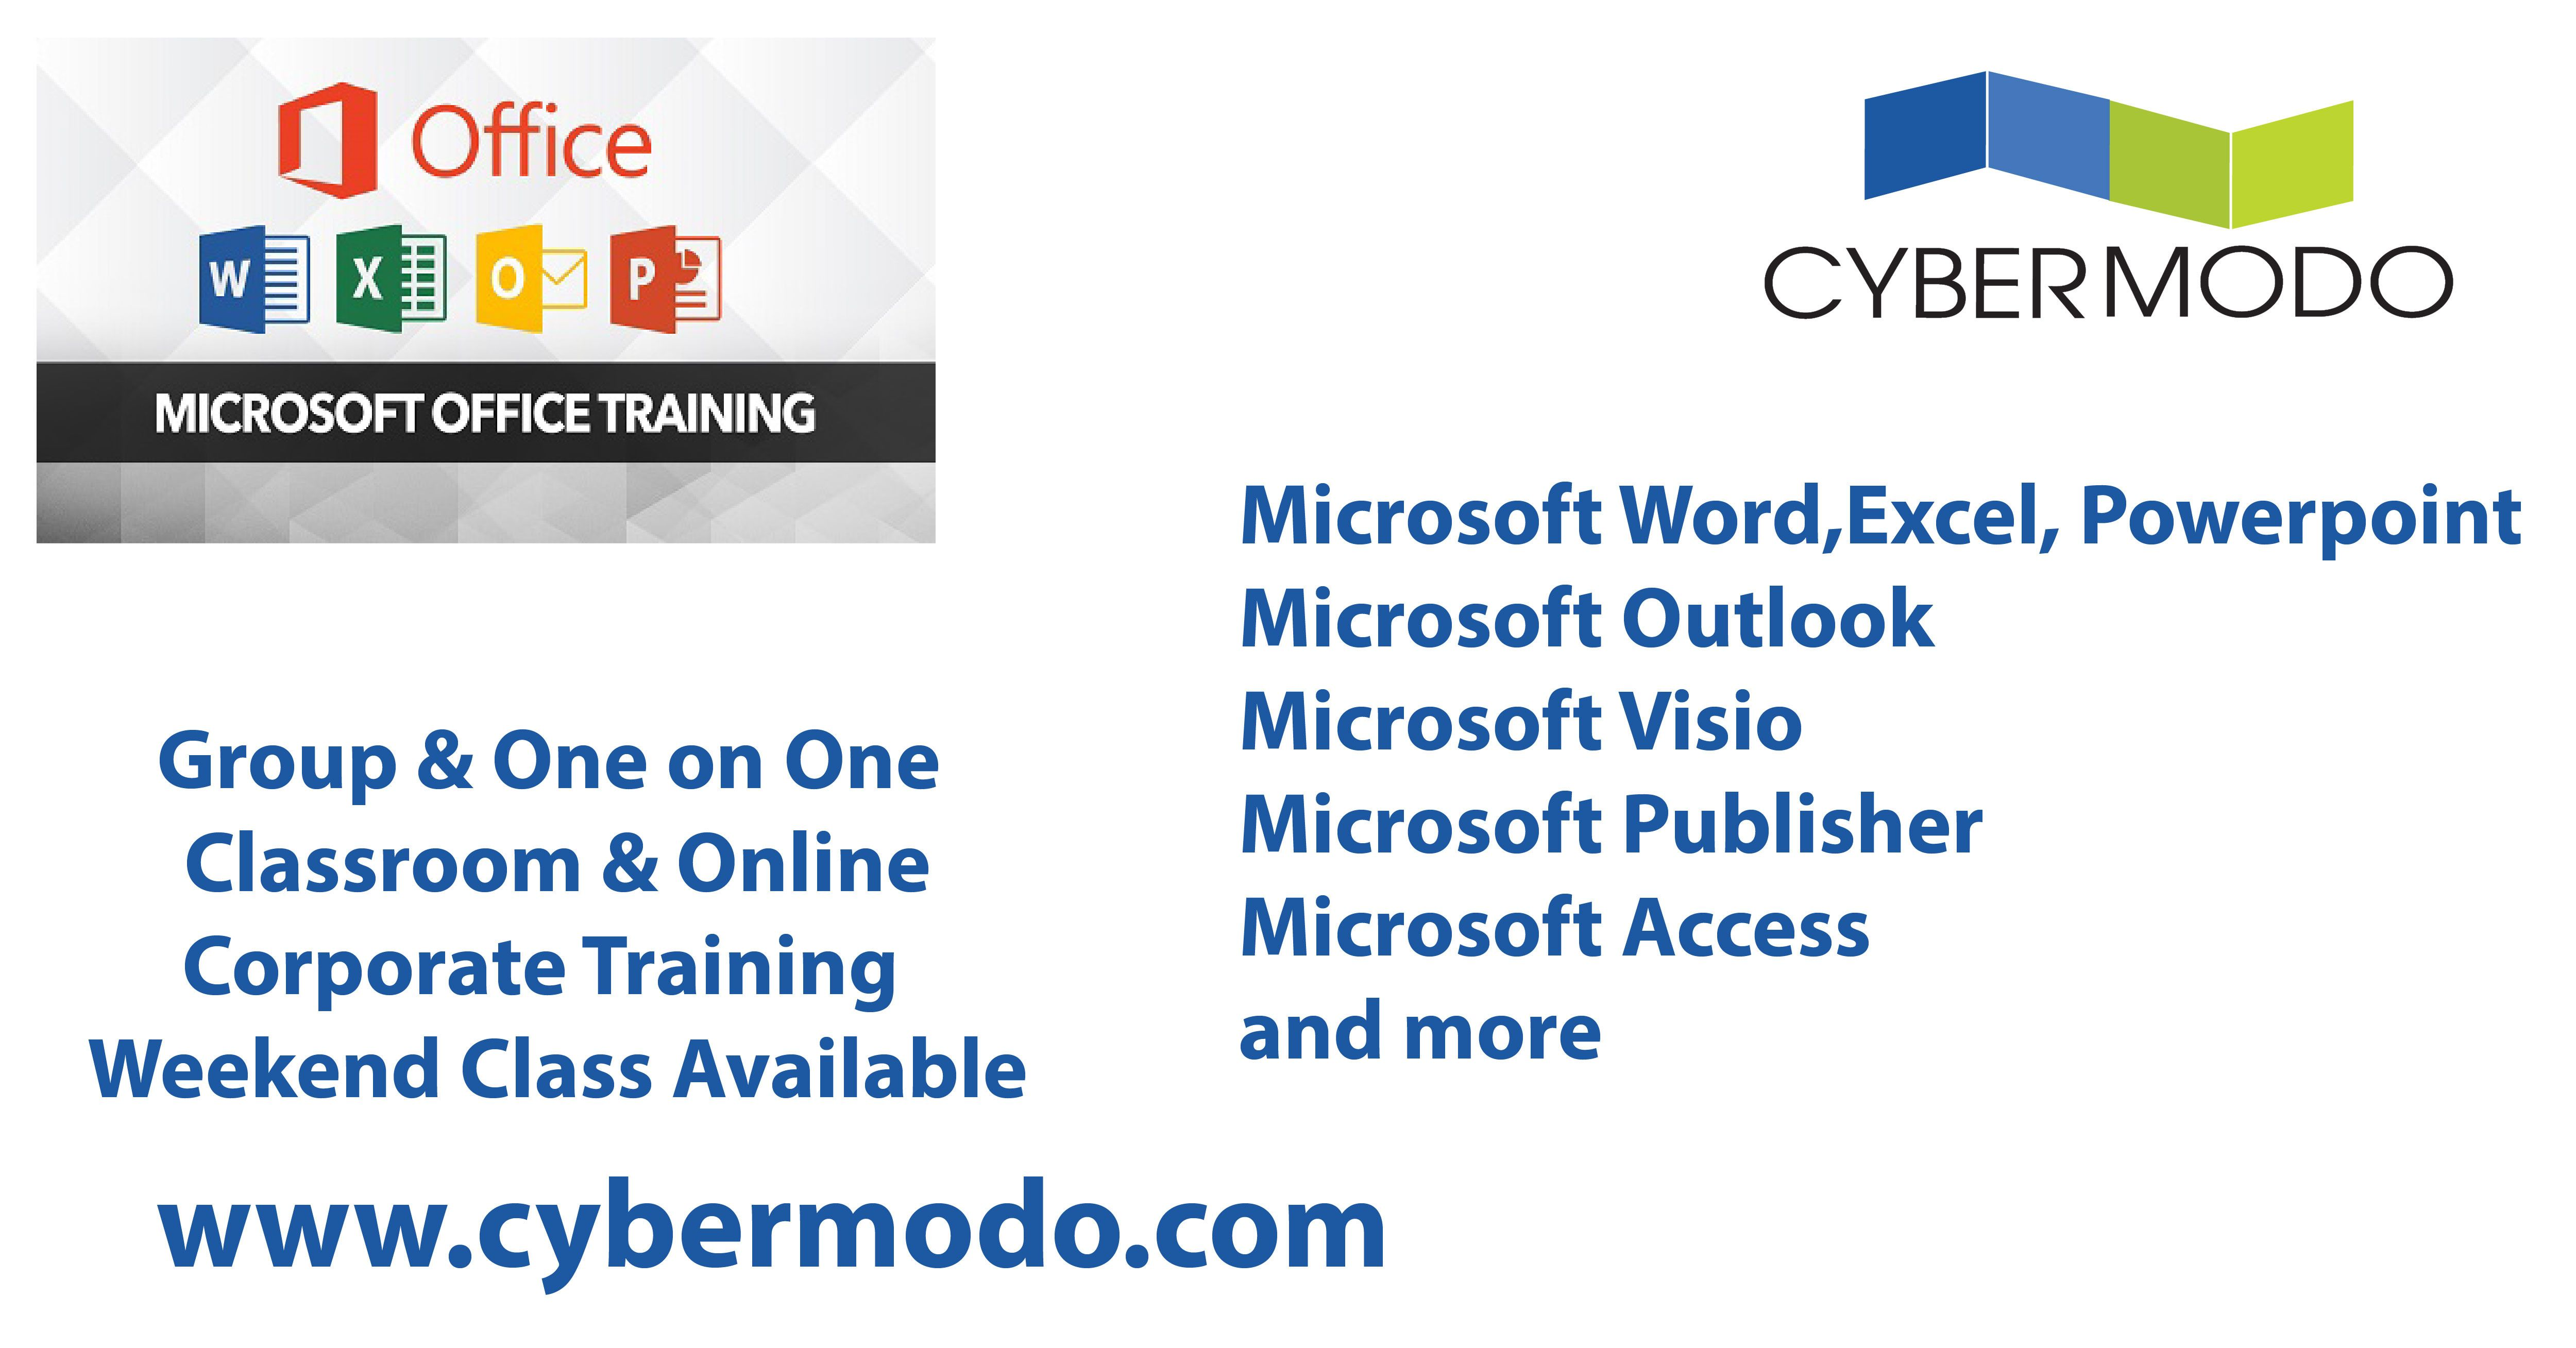 Cyber Modo Solutions 18